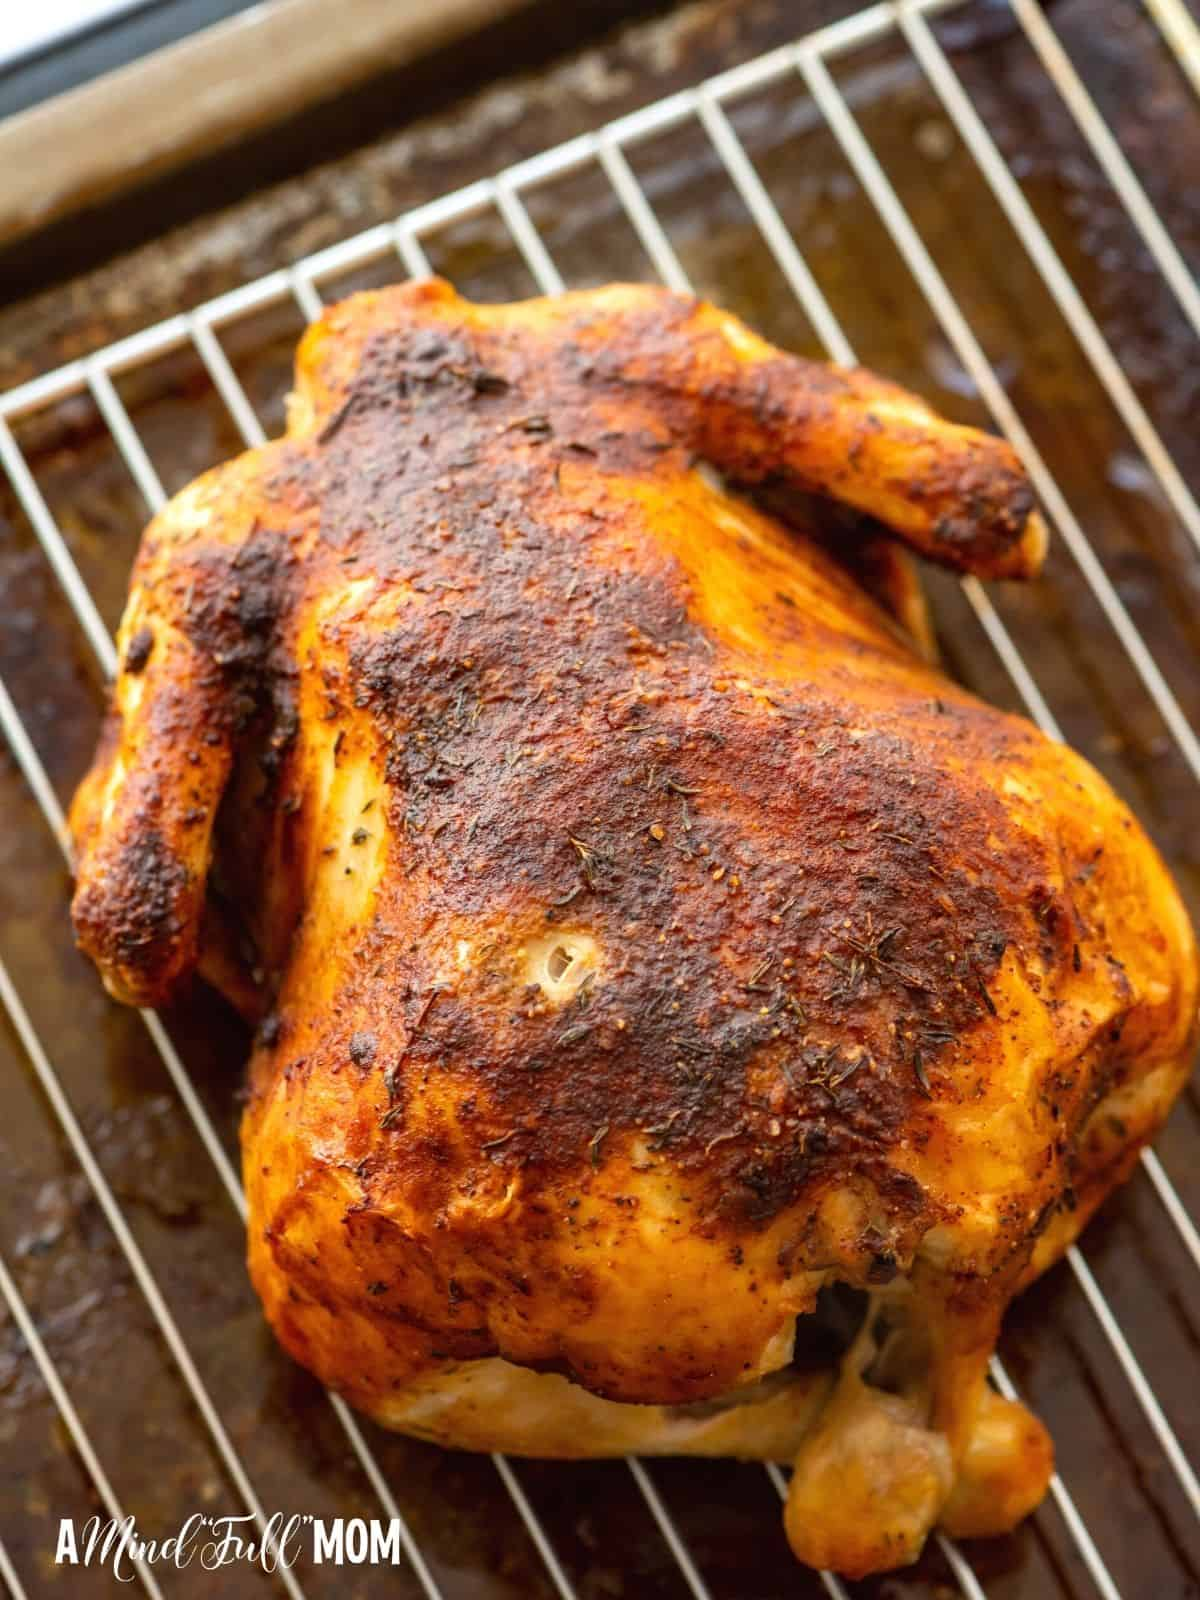 Rotisserie Chicken on Baking Rack.